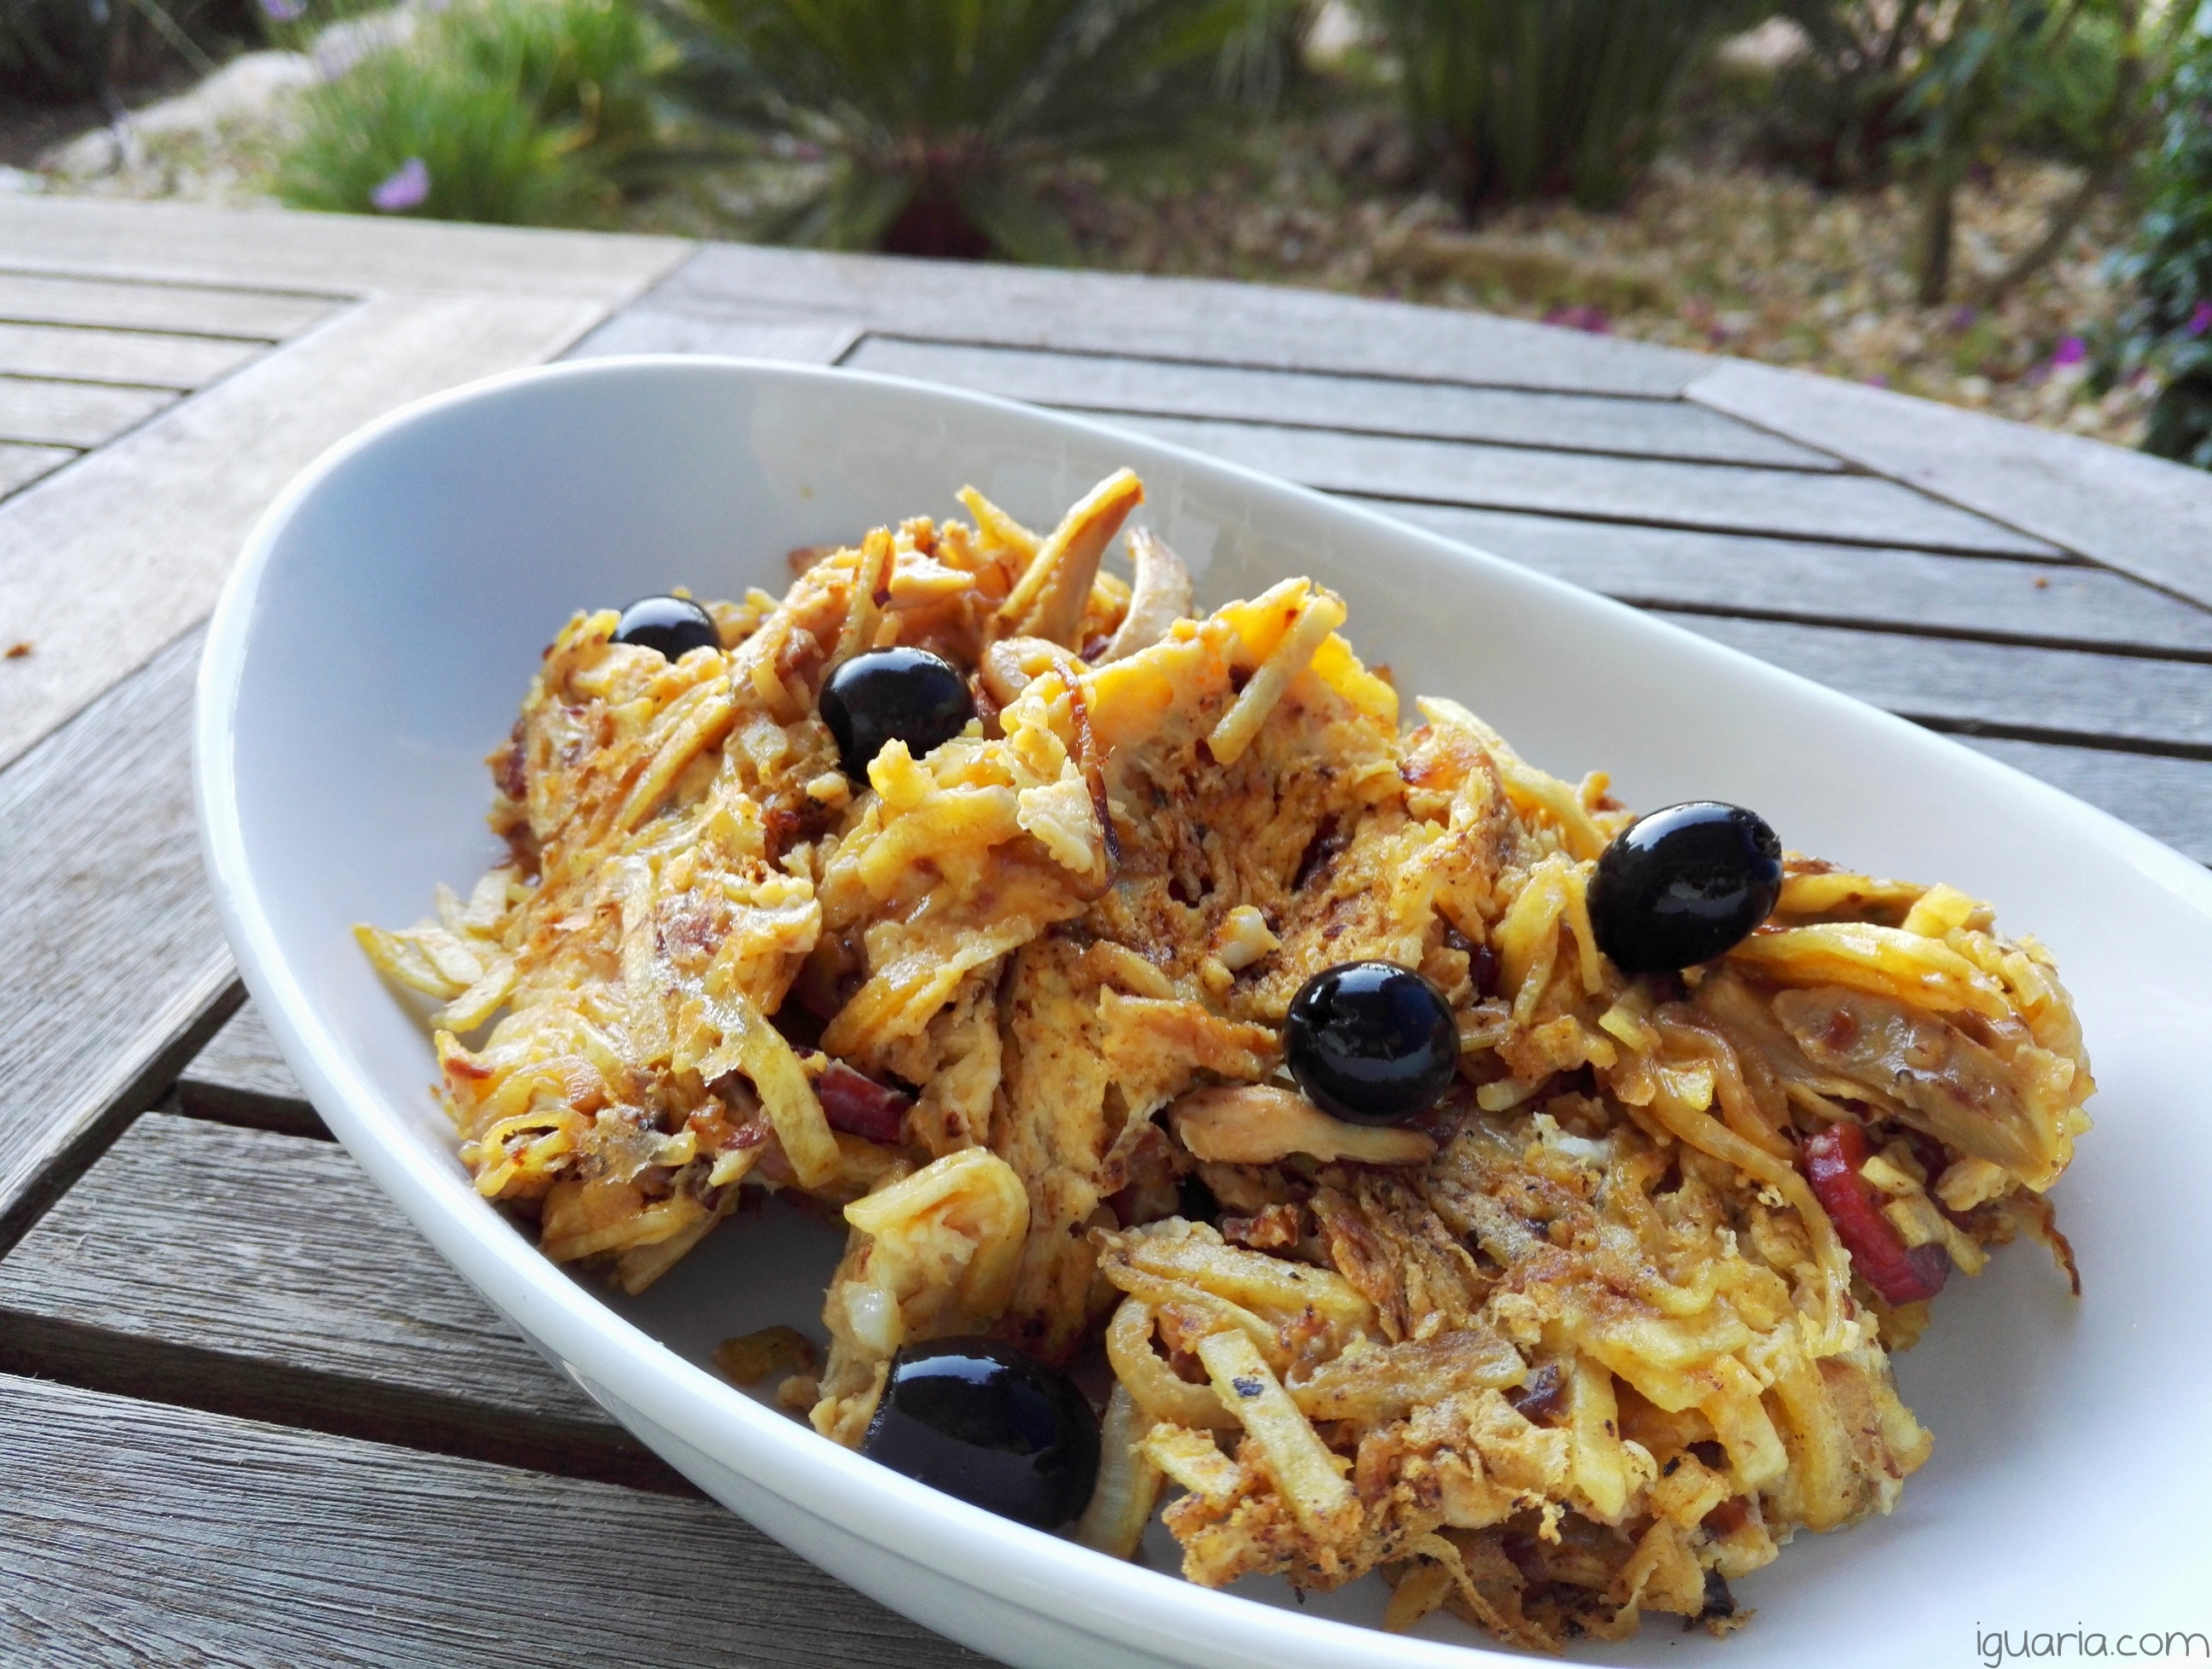 Iguaria_Frango-com-Ovo-Batata-Frita